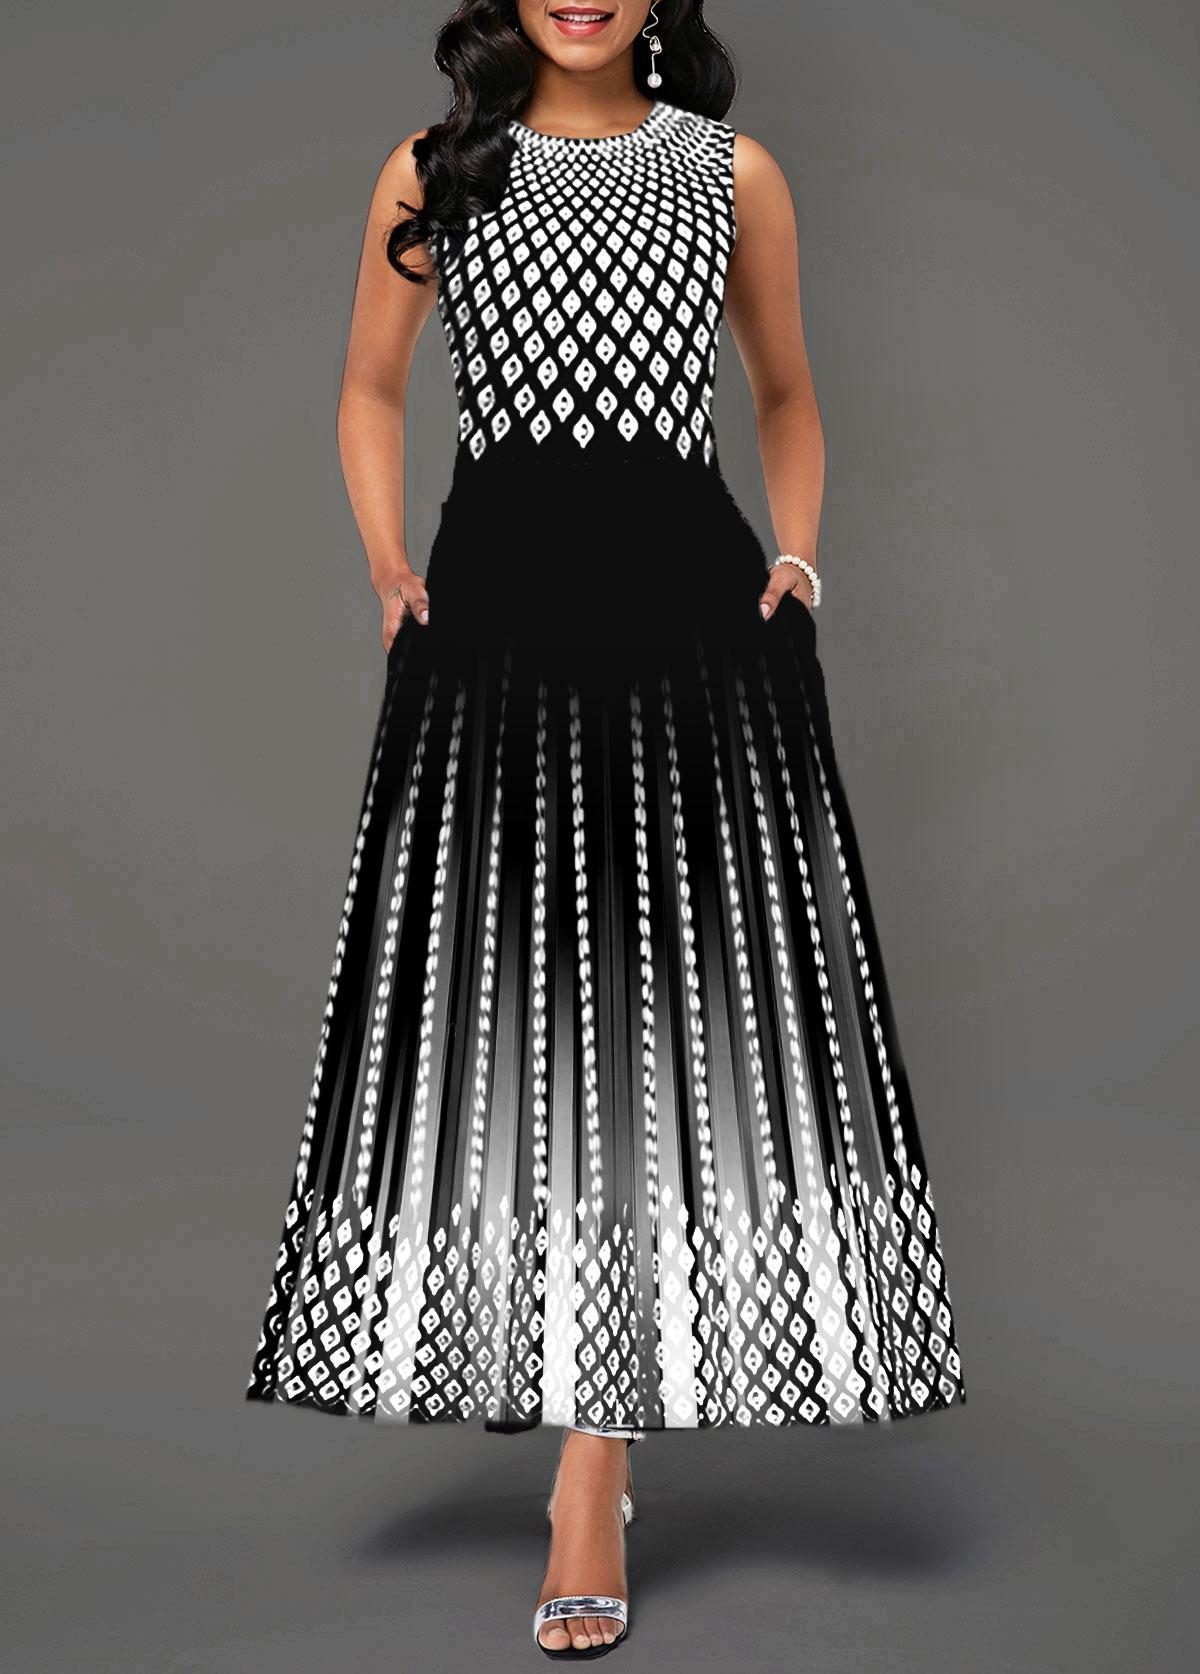 Sleeveless Round Neck High Waist Dress